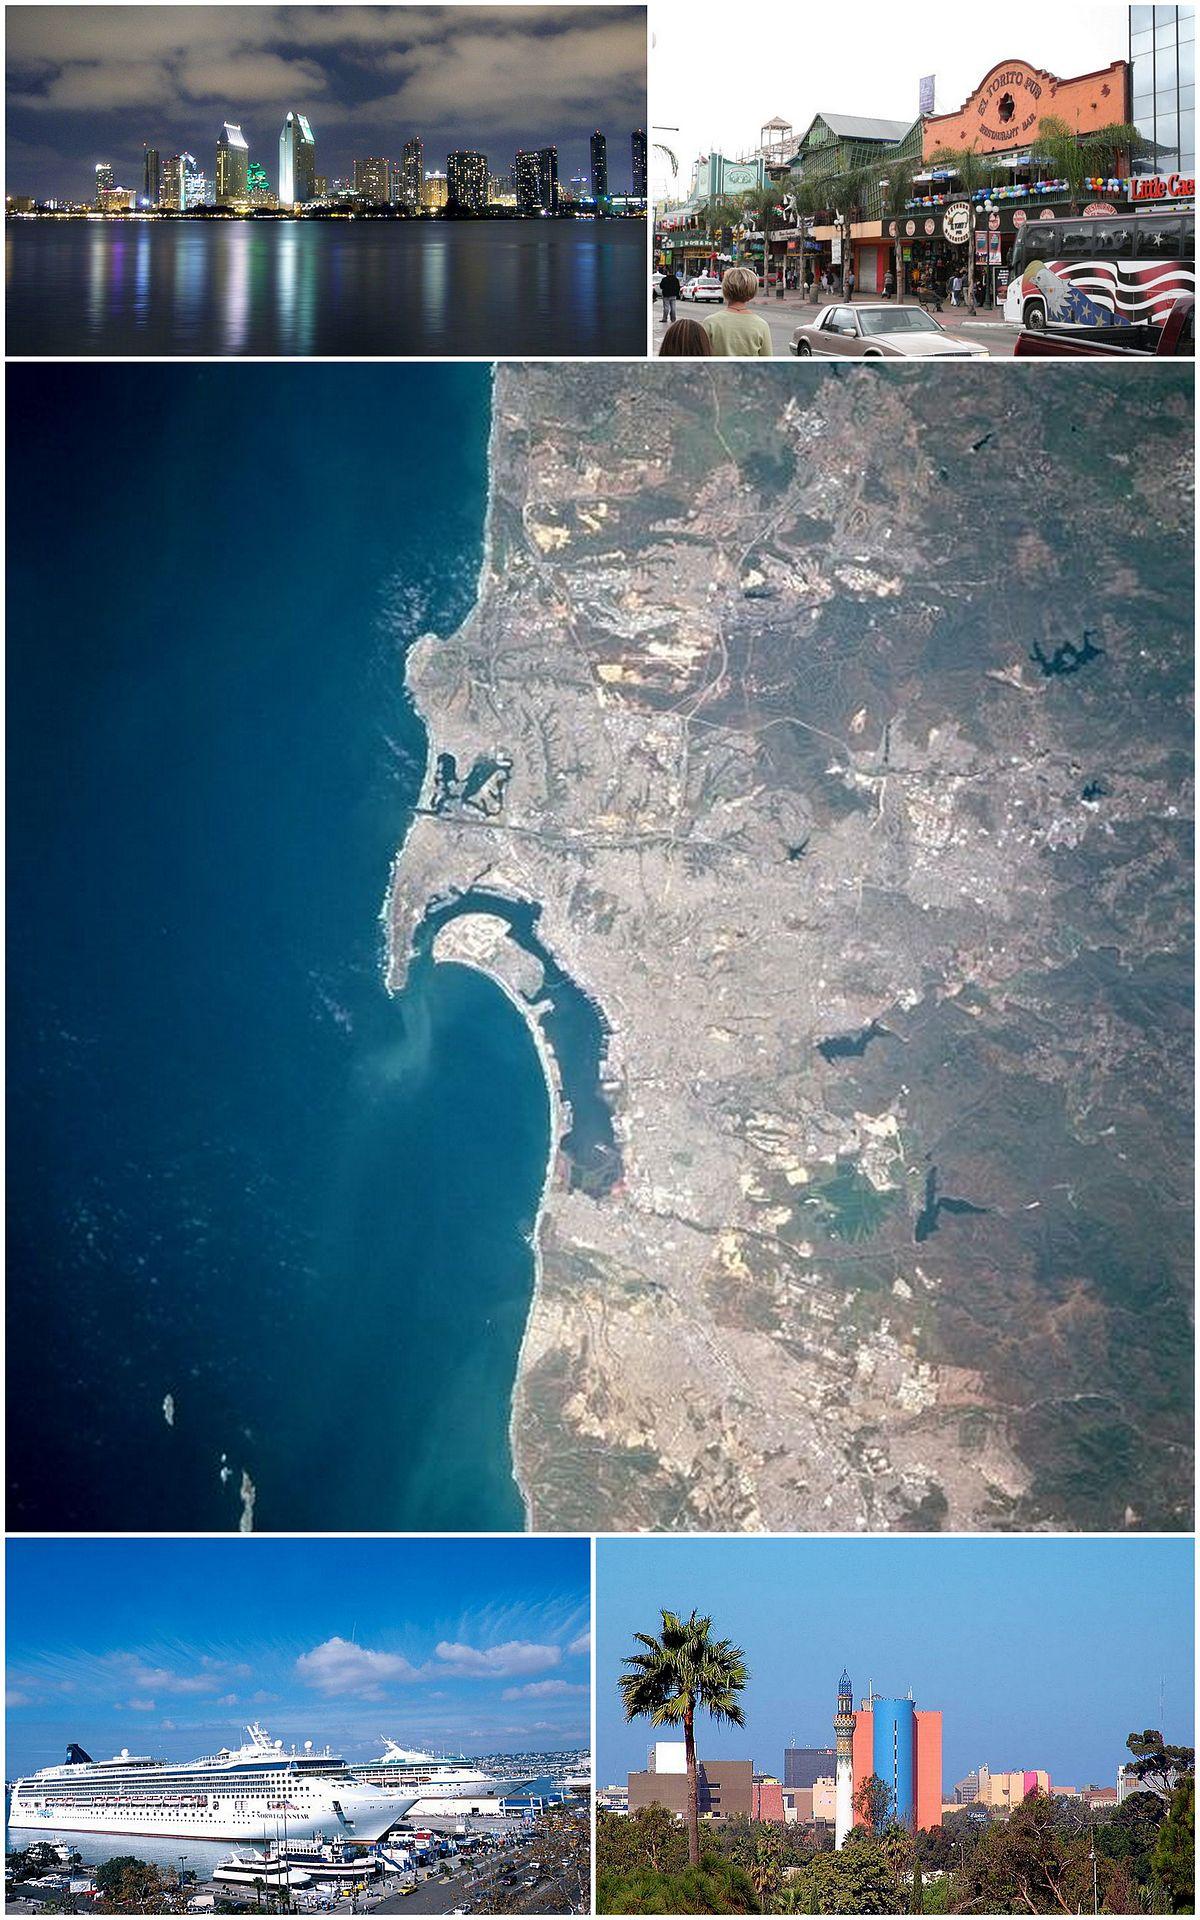 Puerto Nuevo, Baja California - Wikipedia